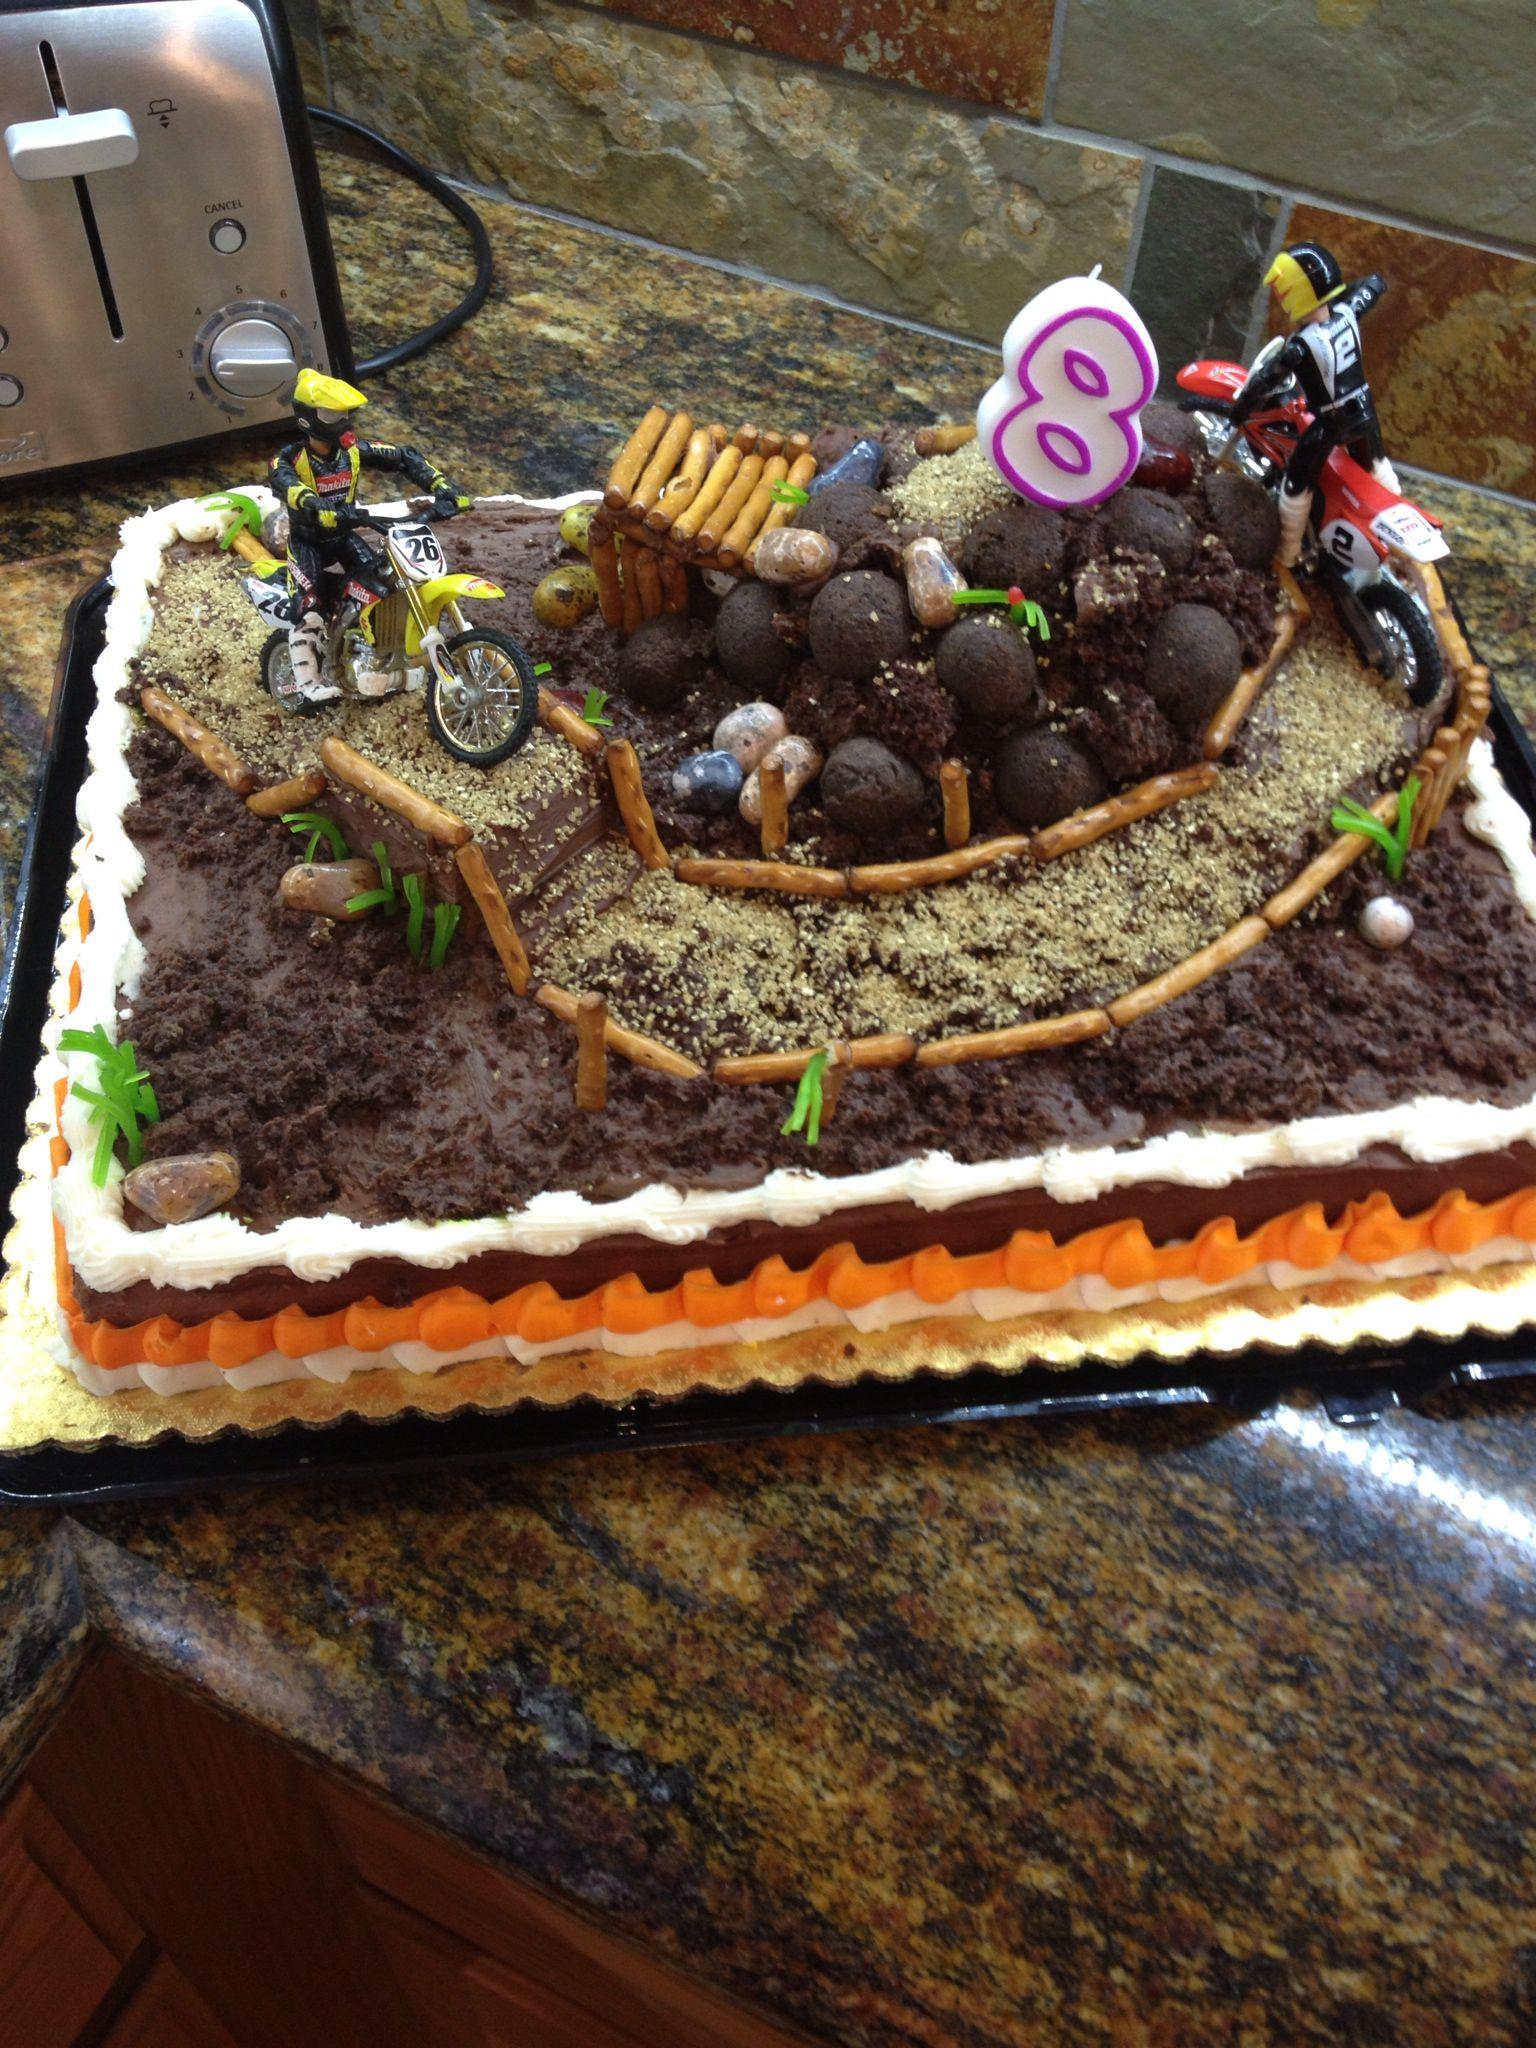 Terrific Coltons Dirt Bike Cake Birthday Cake Kids Bike Cakes Dirt Personalised Birthday Cards Paralily Jamesorg